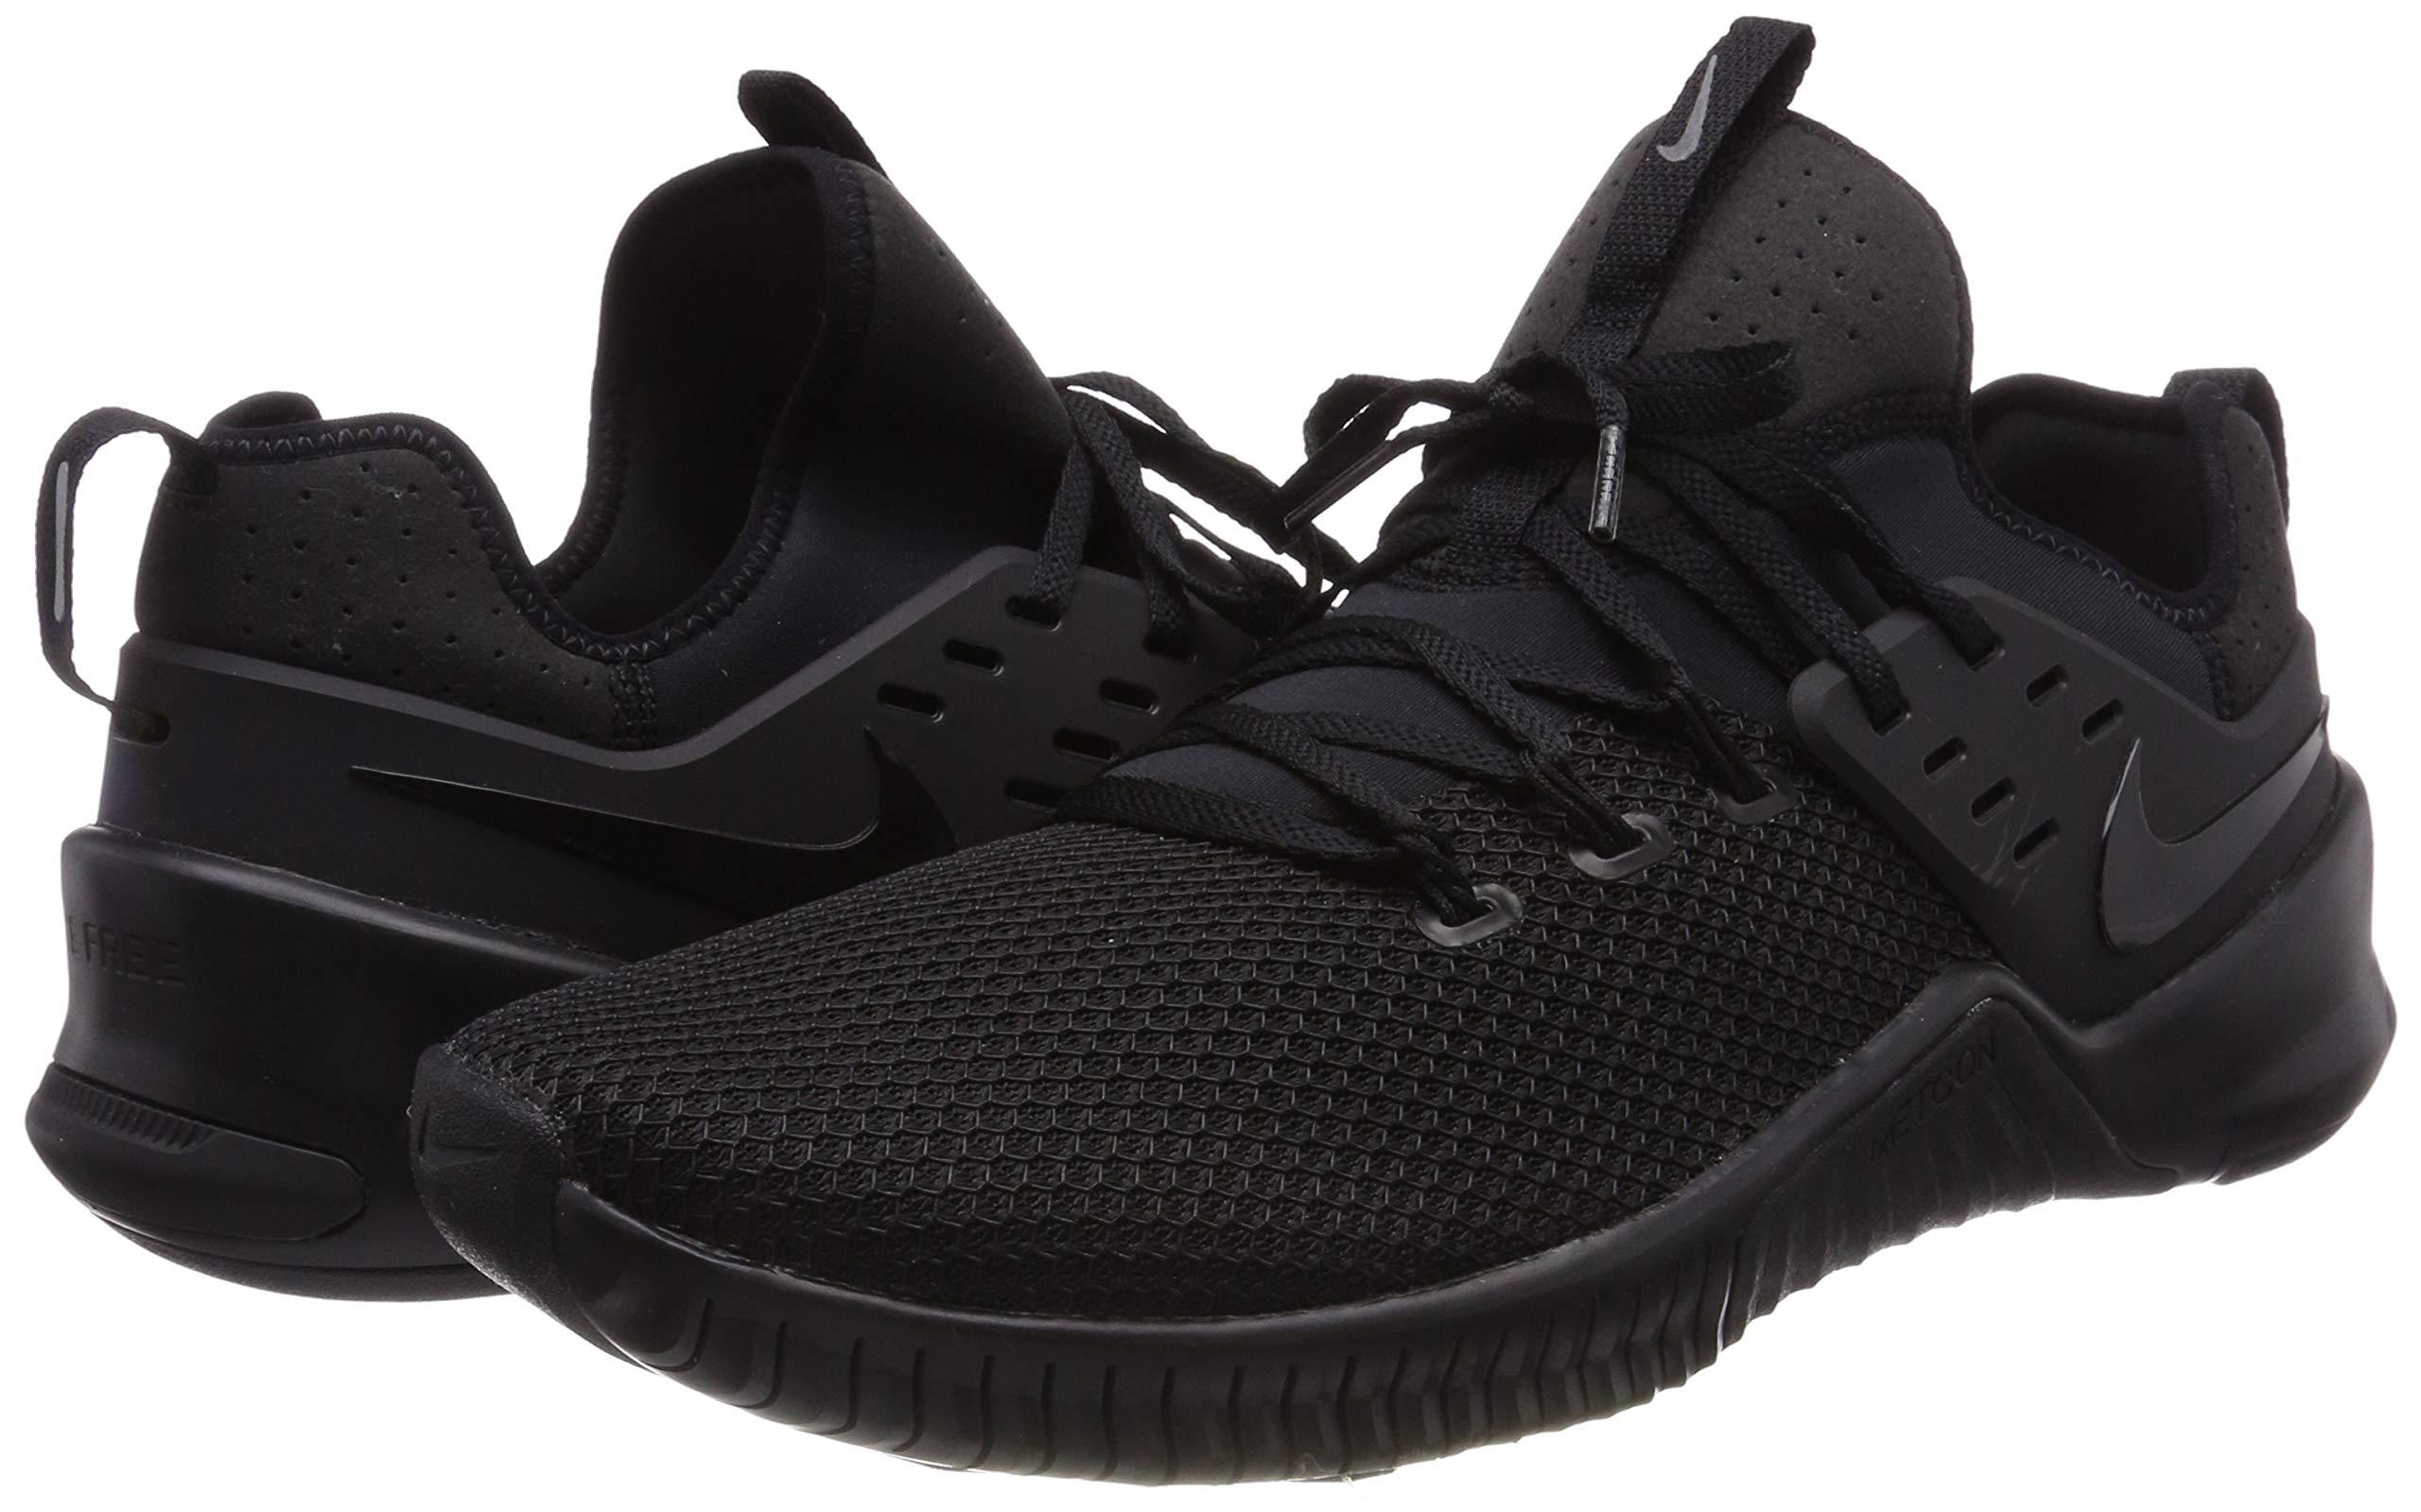 815LPe%2BWmgL - Nike Men's Herren Trainingsschuh Free X Metcon Fitness Shoes